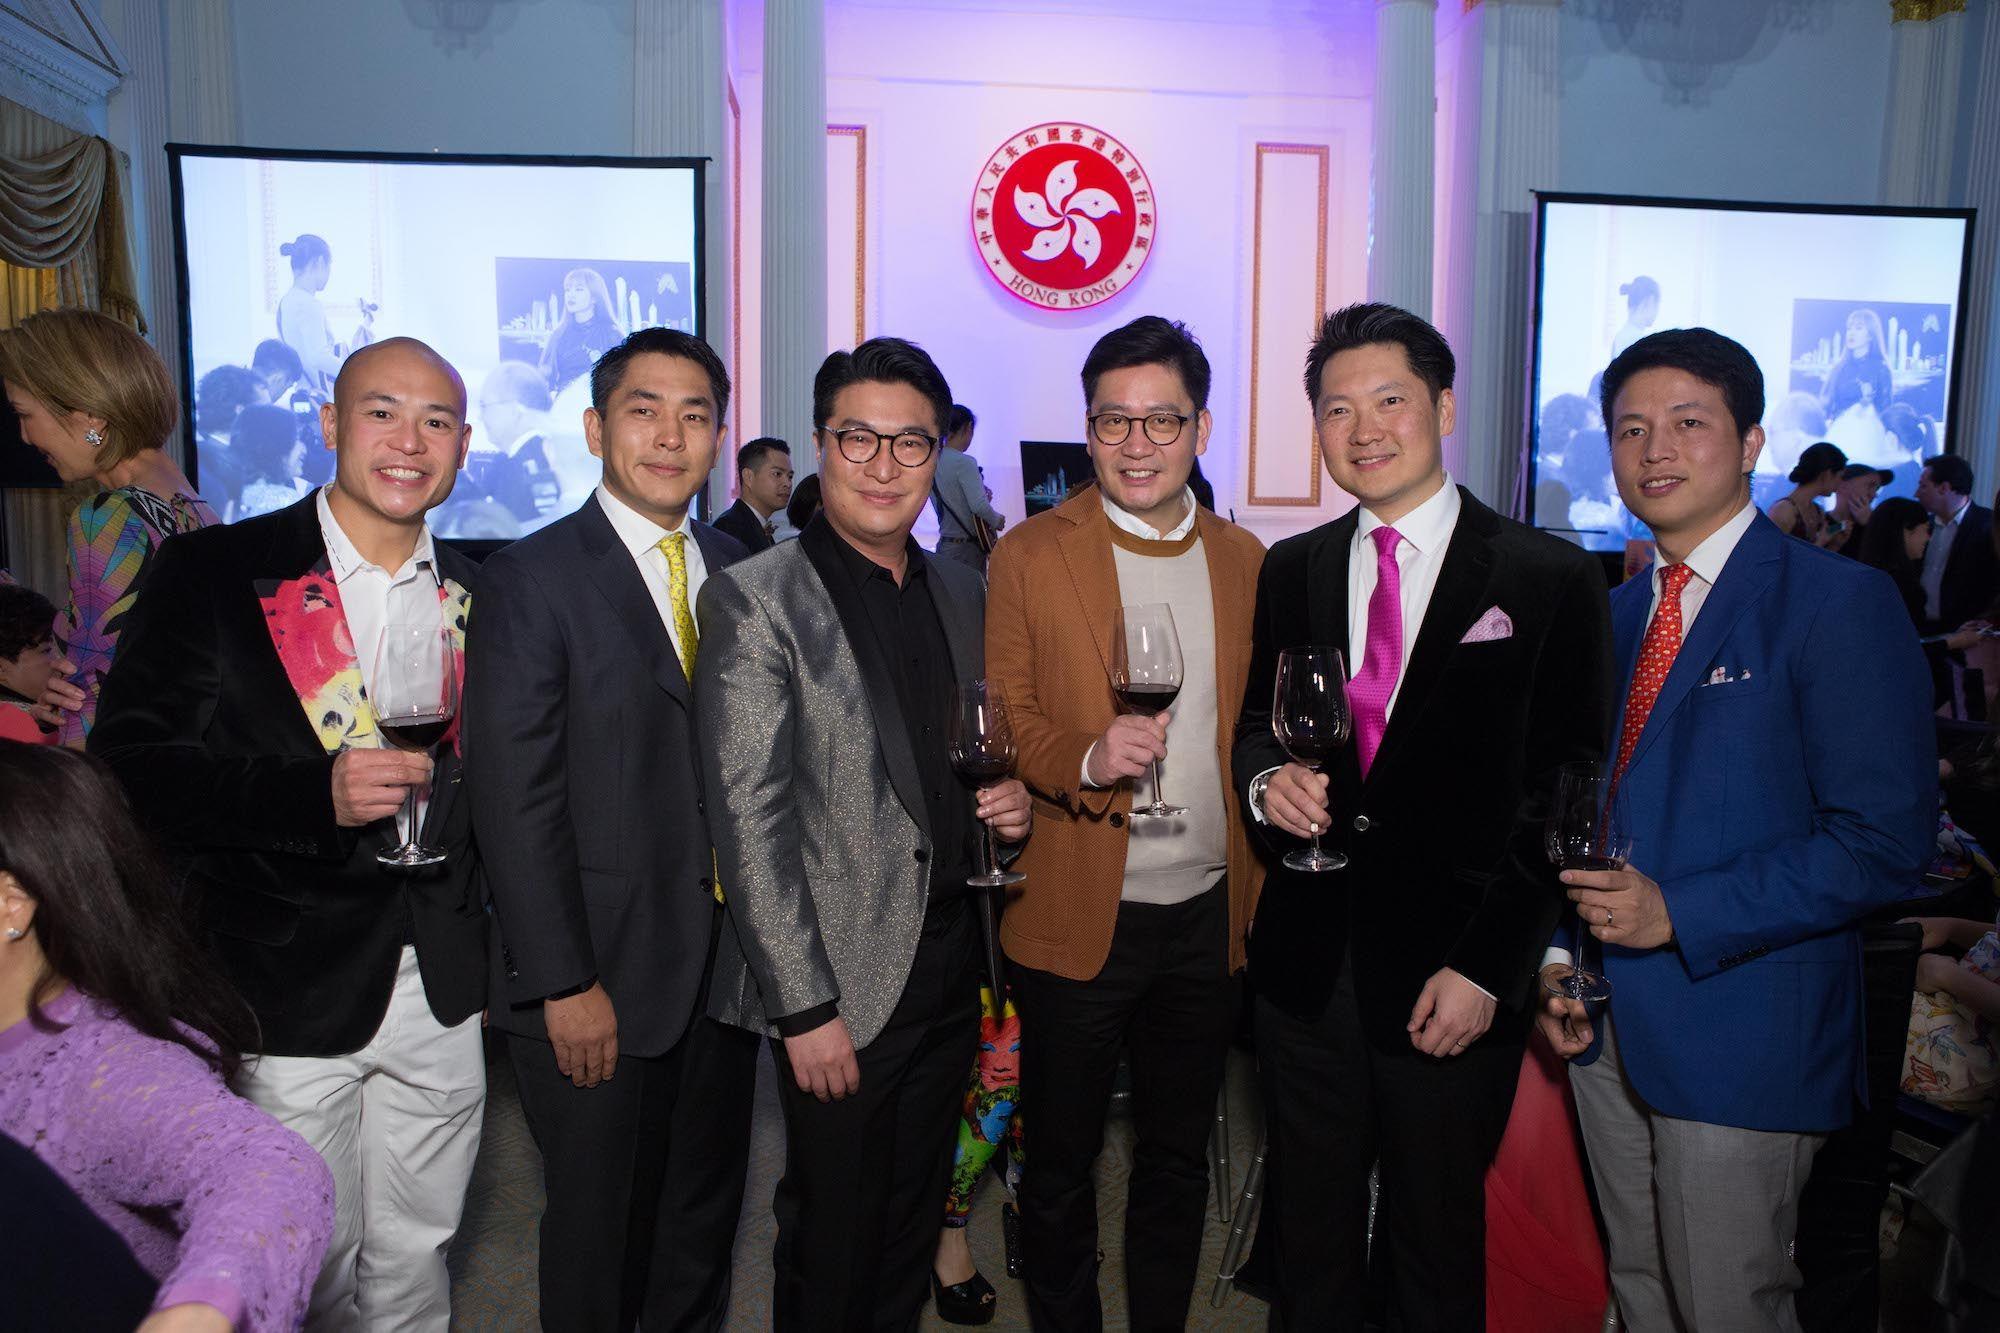 Justin Hui, Kent Ho, Martin Lee, Brian Li, Julian Liu, Tommy Hui